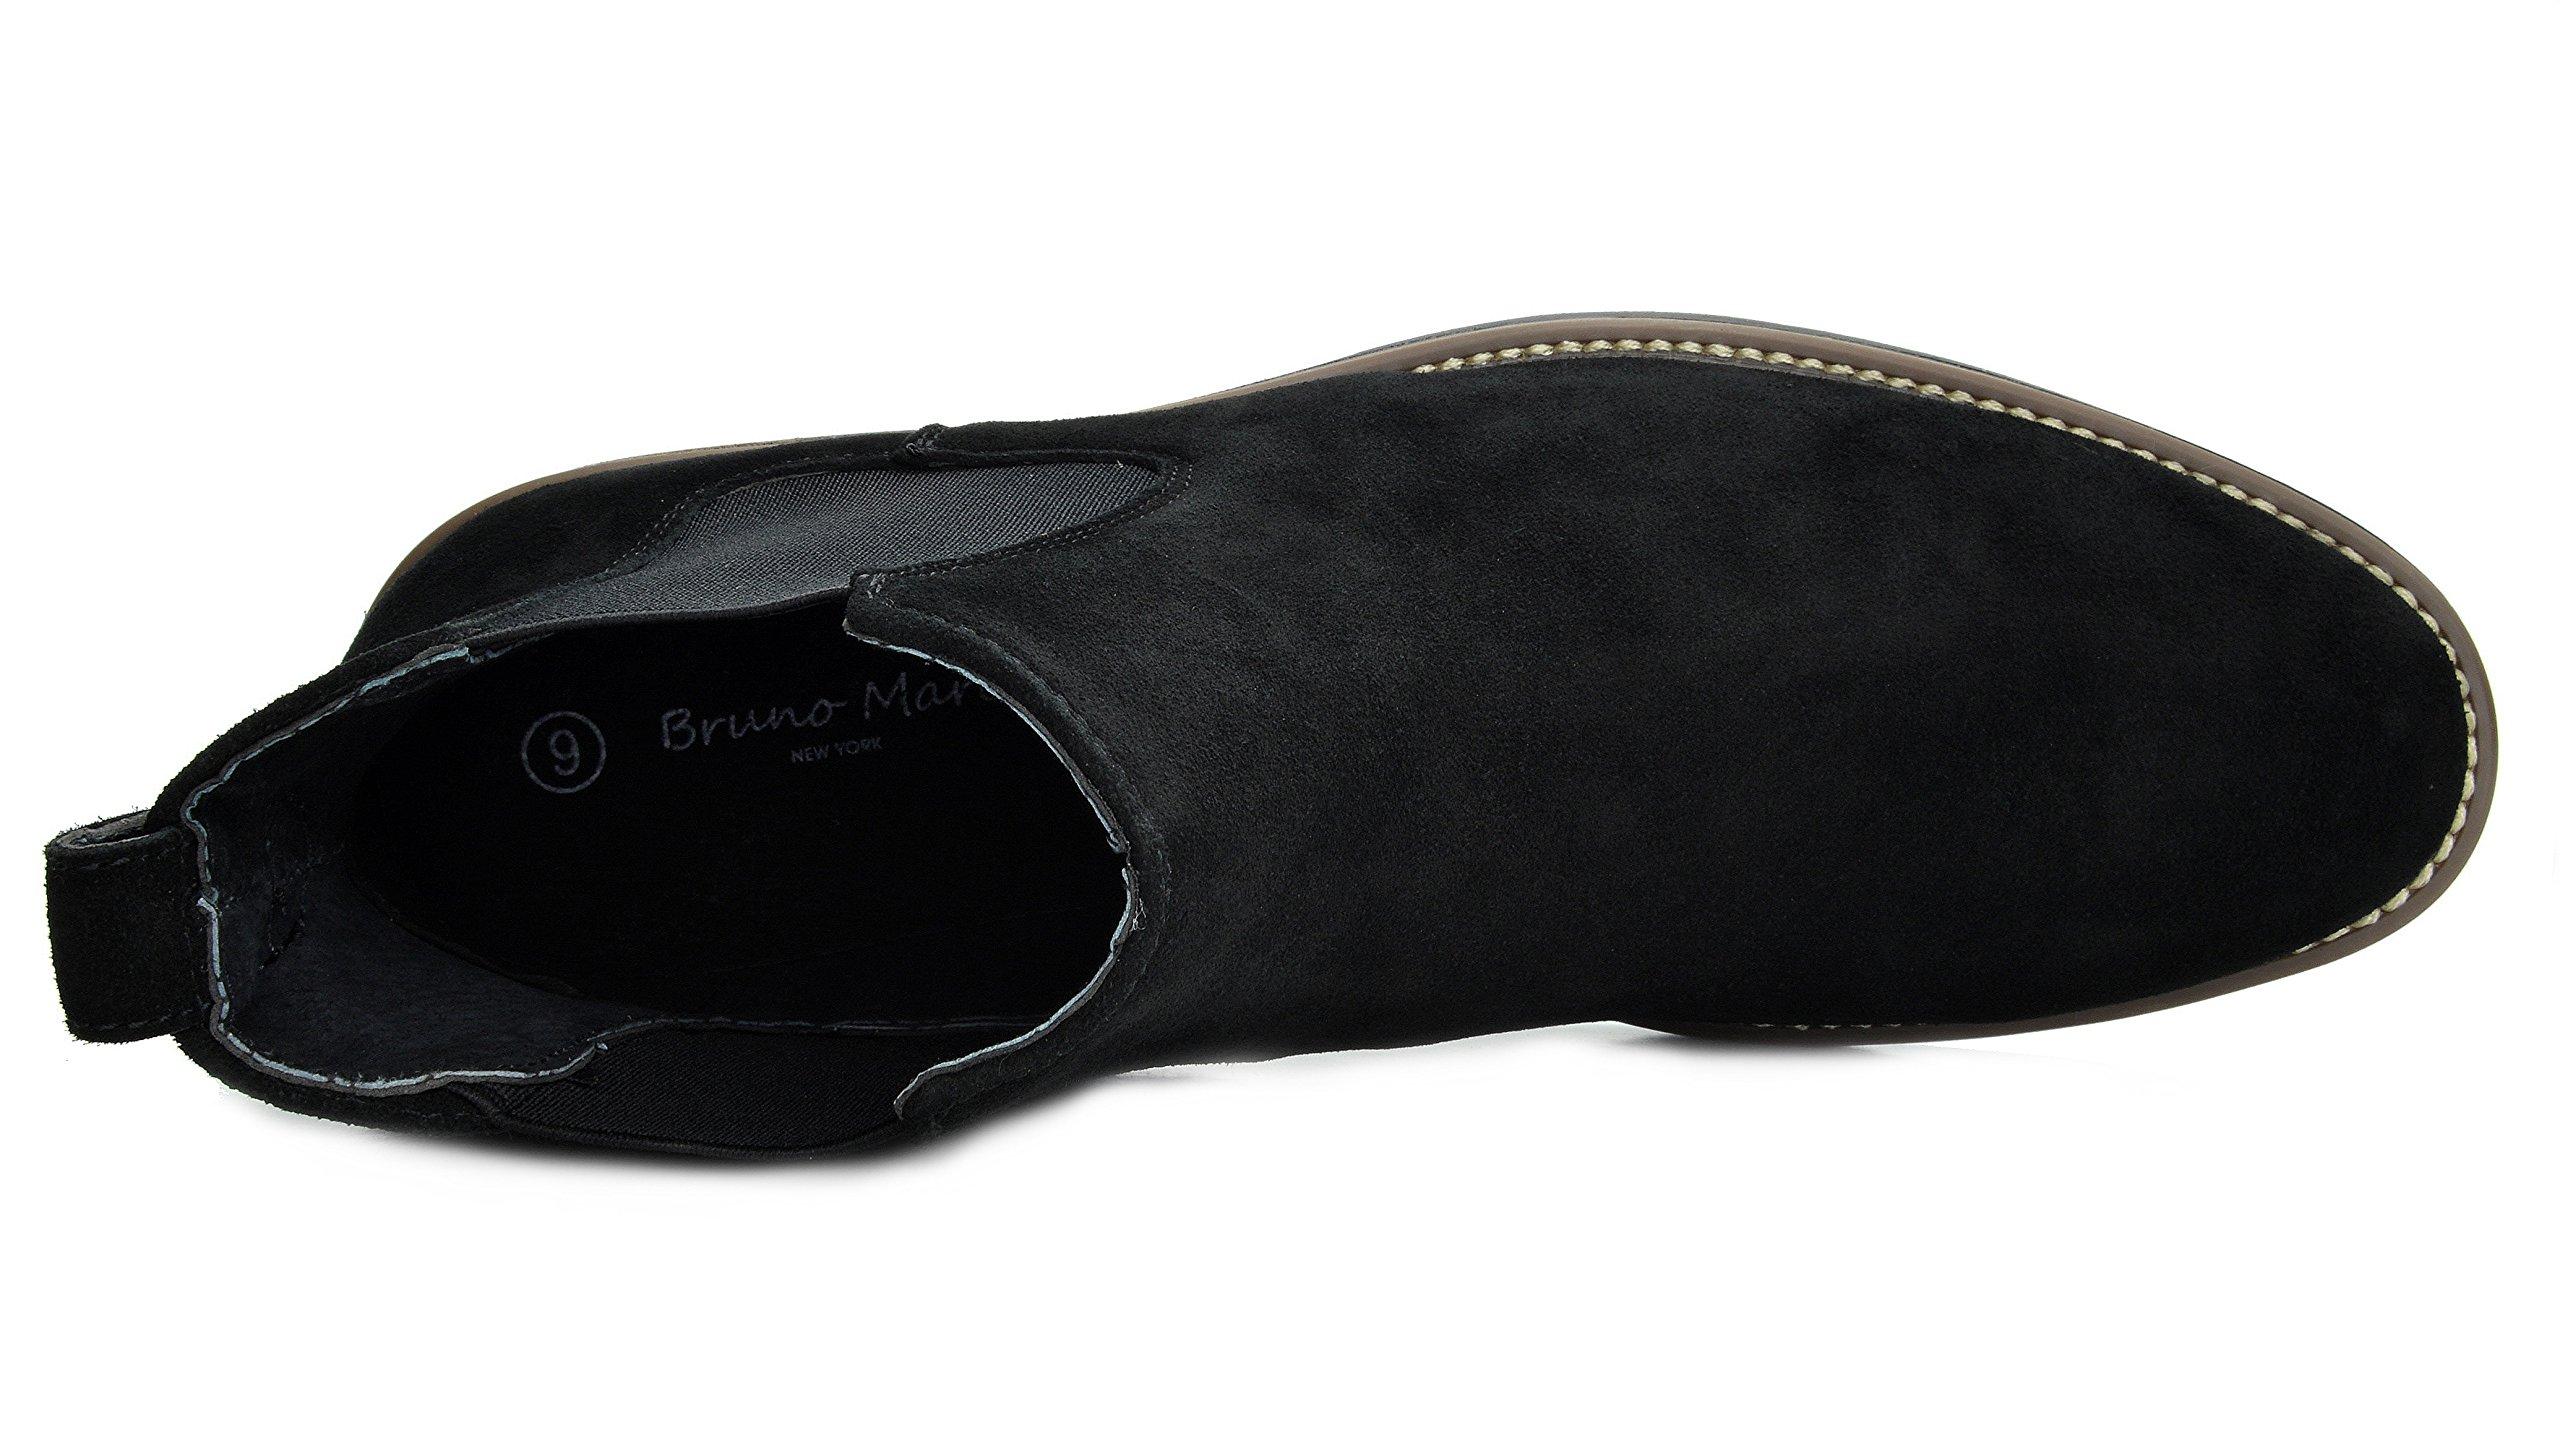 c138ad736eb02 BRUNO MARC NEW YORK Men's Urban-06 Suede Leather Chukka Ankle Boots.  starstarstarstarstar_half